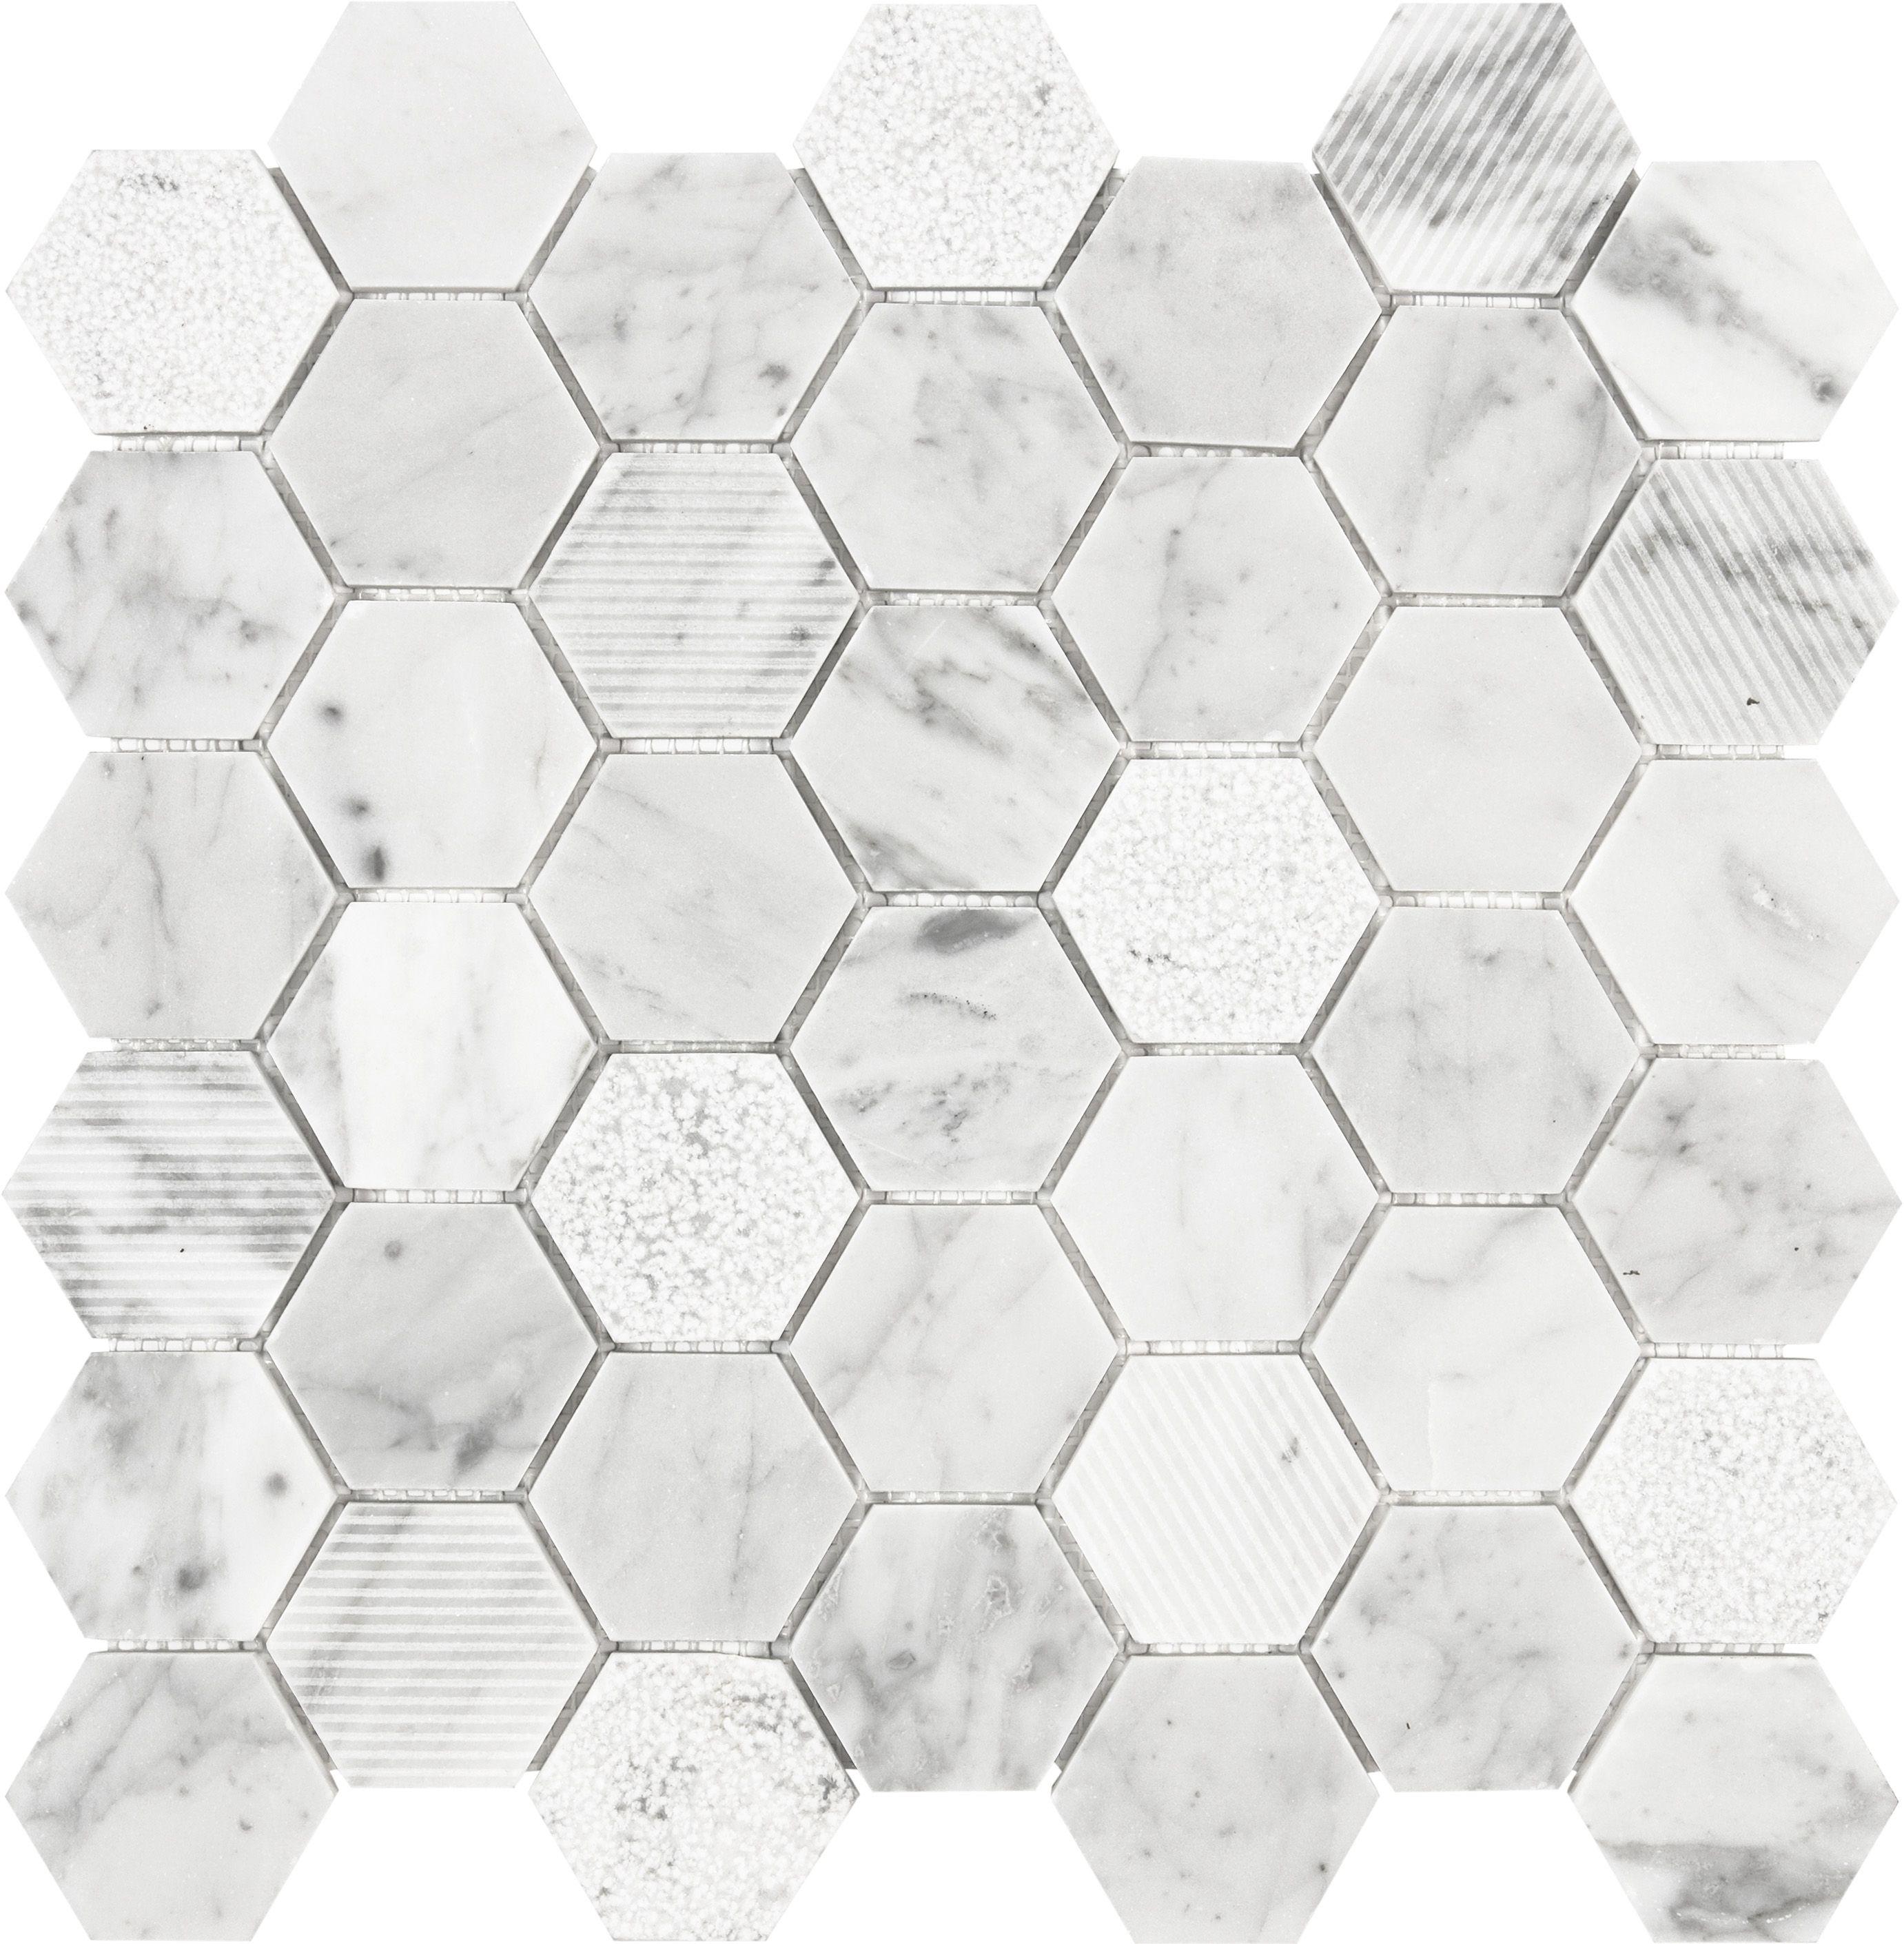 Natural stone bathroom tiles 25 off marshalls natural stone tiles - Shop Anatolia Tile Carrara Honeycomb Mosaic Natural Stone Marble Wall Tile Common X Actual